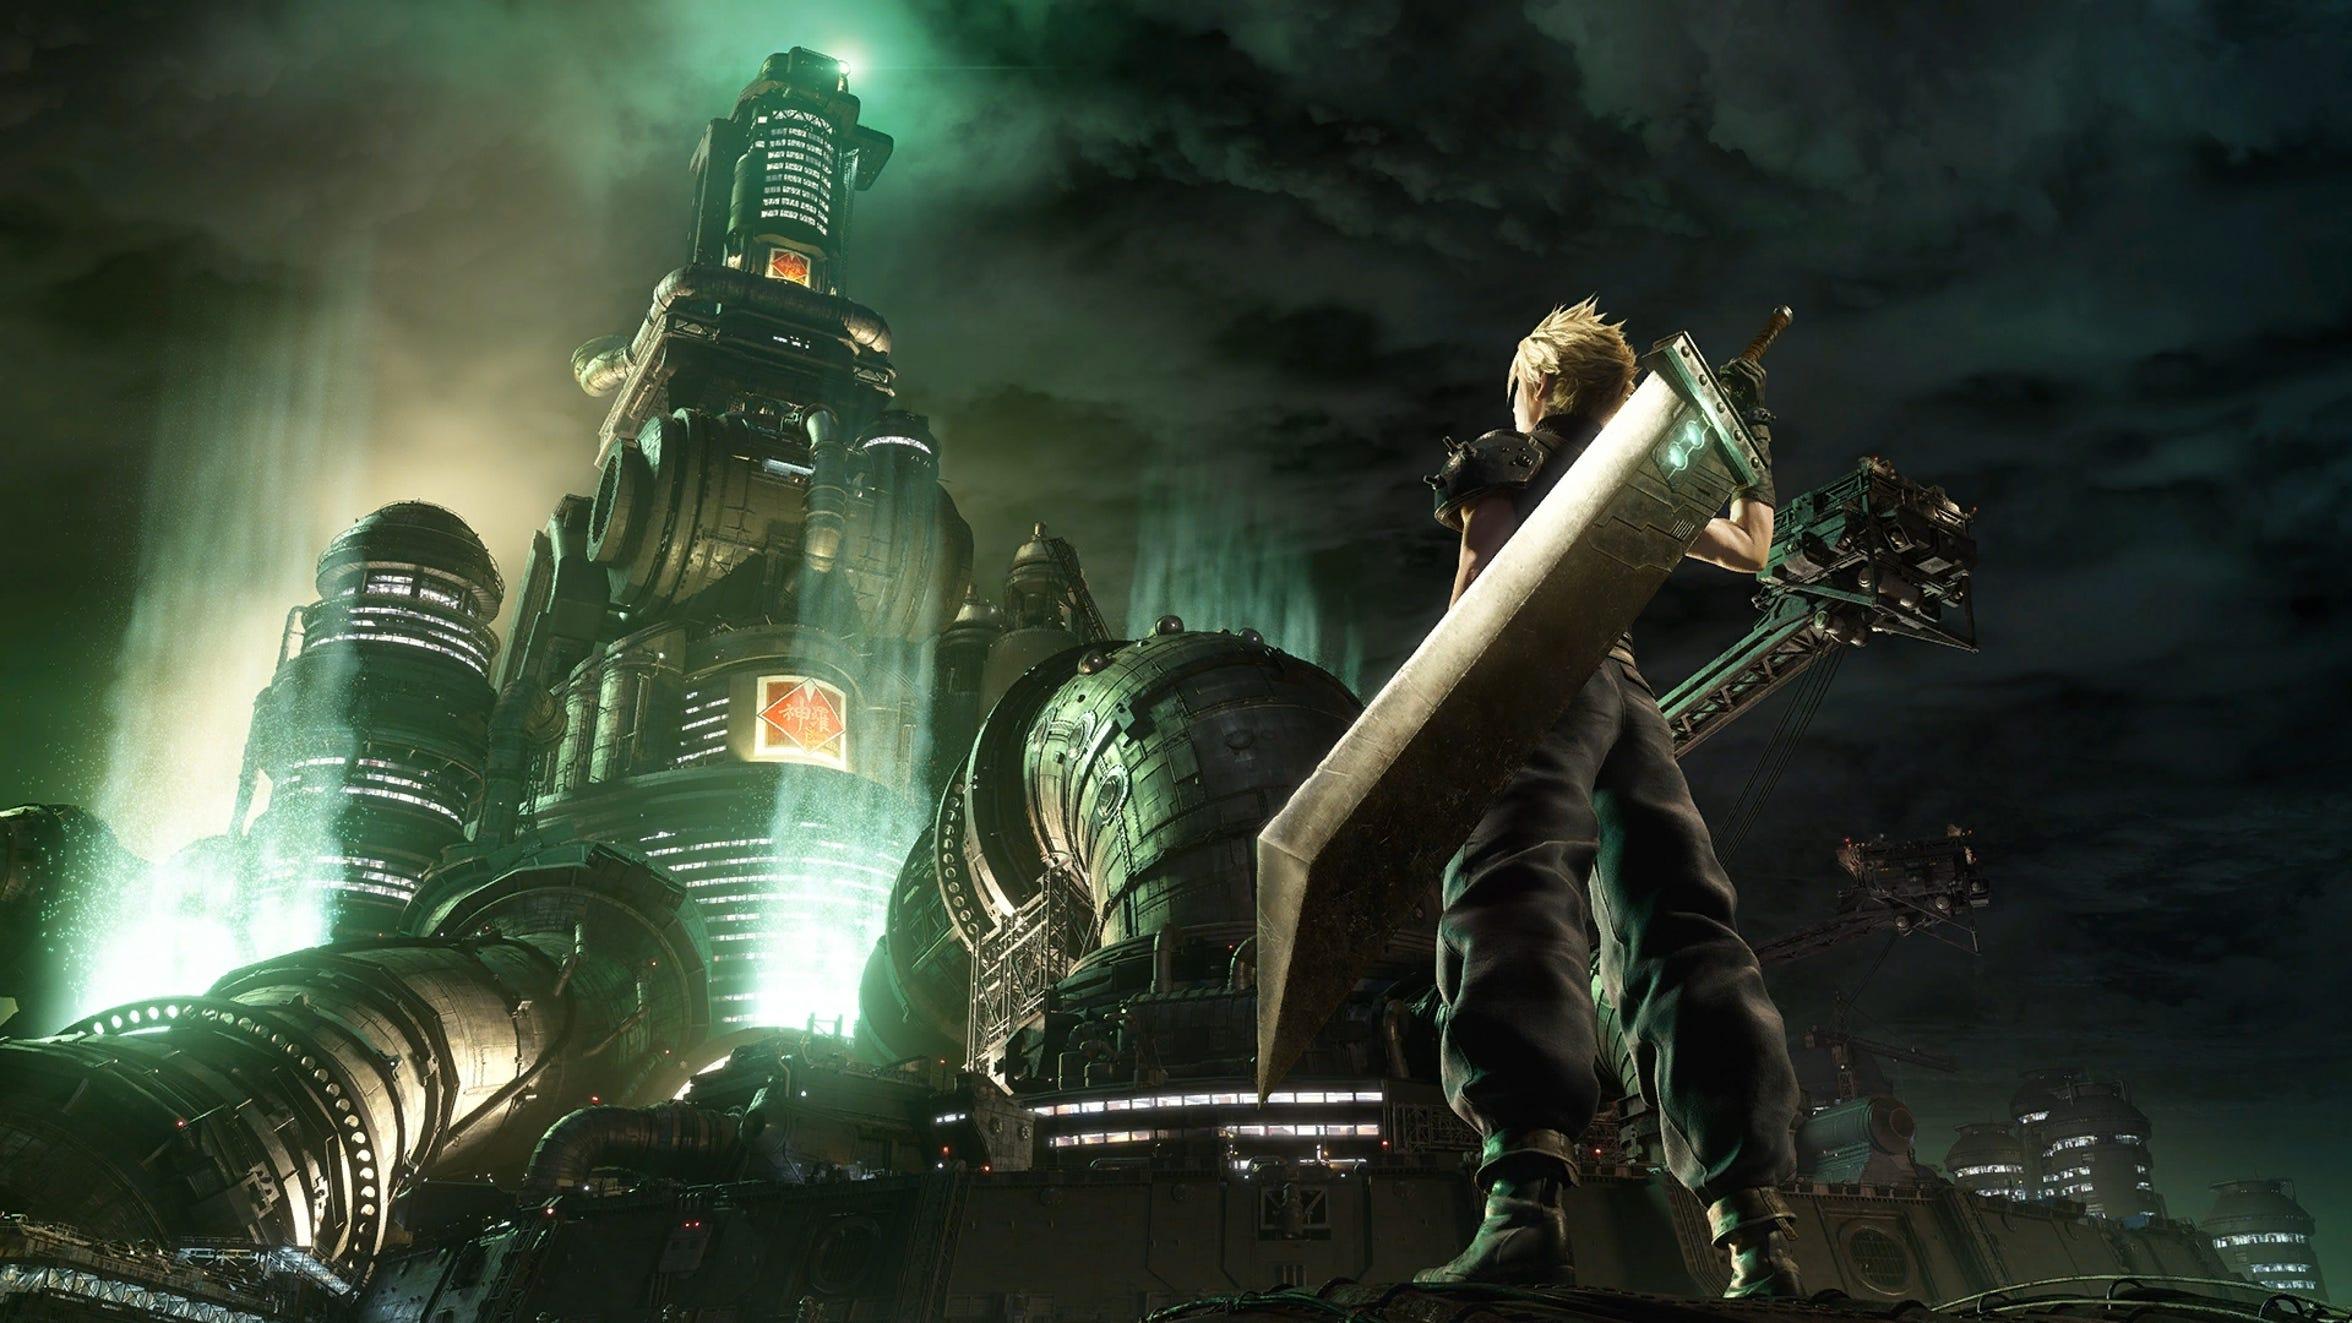 Cloud in front of  Mako Reactor 1 in Final Fantasy VII Remake.